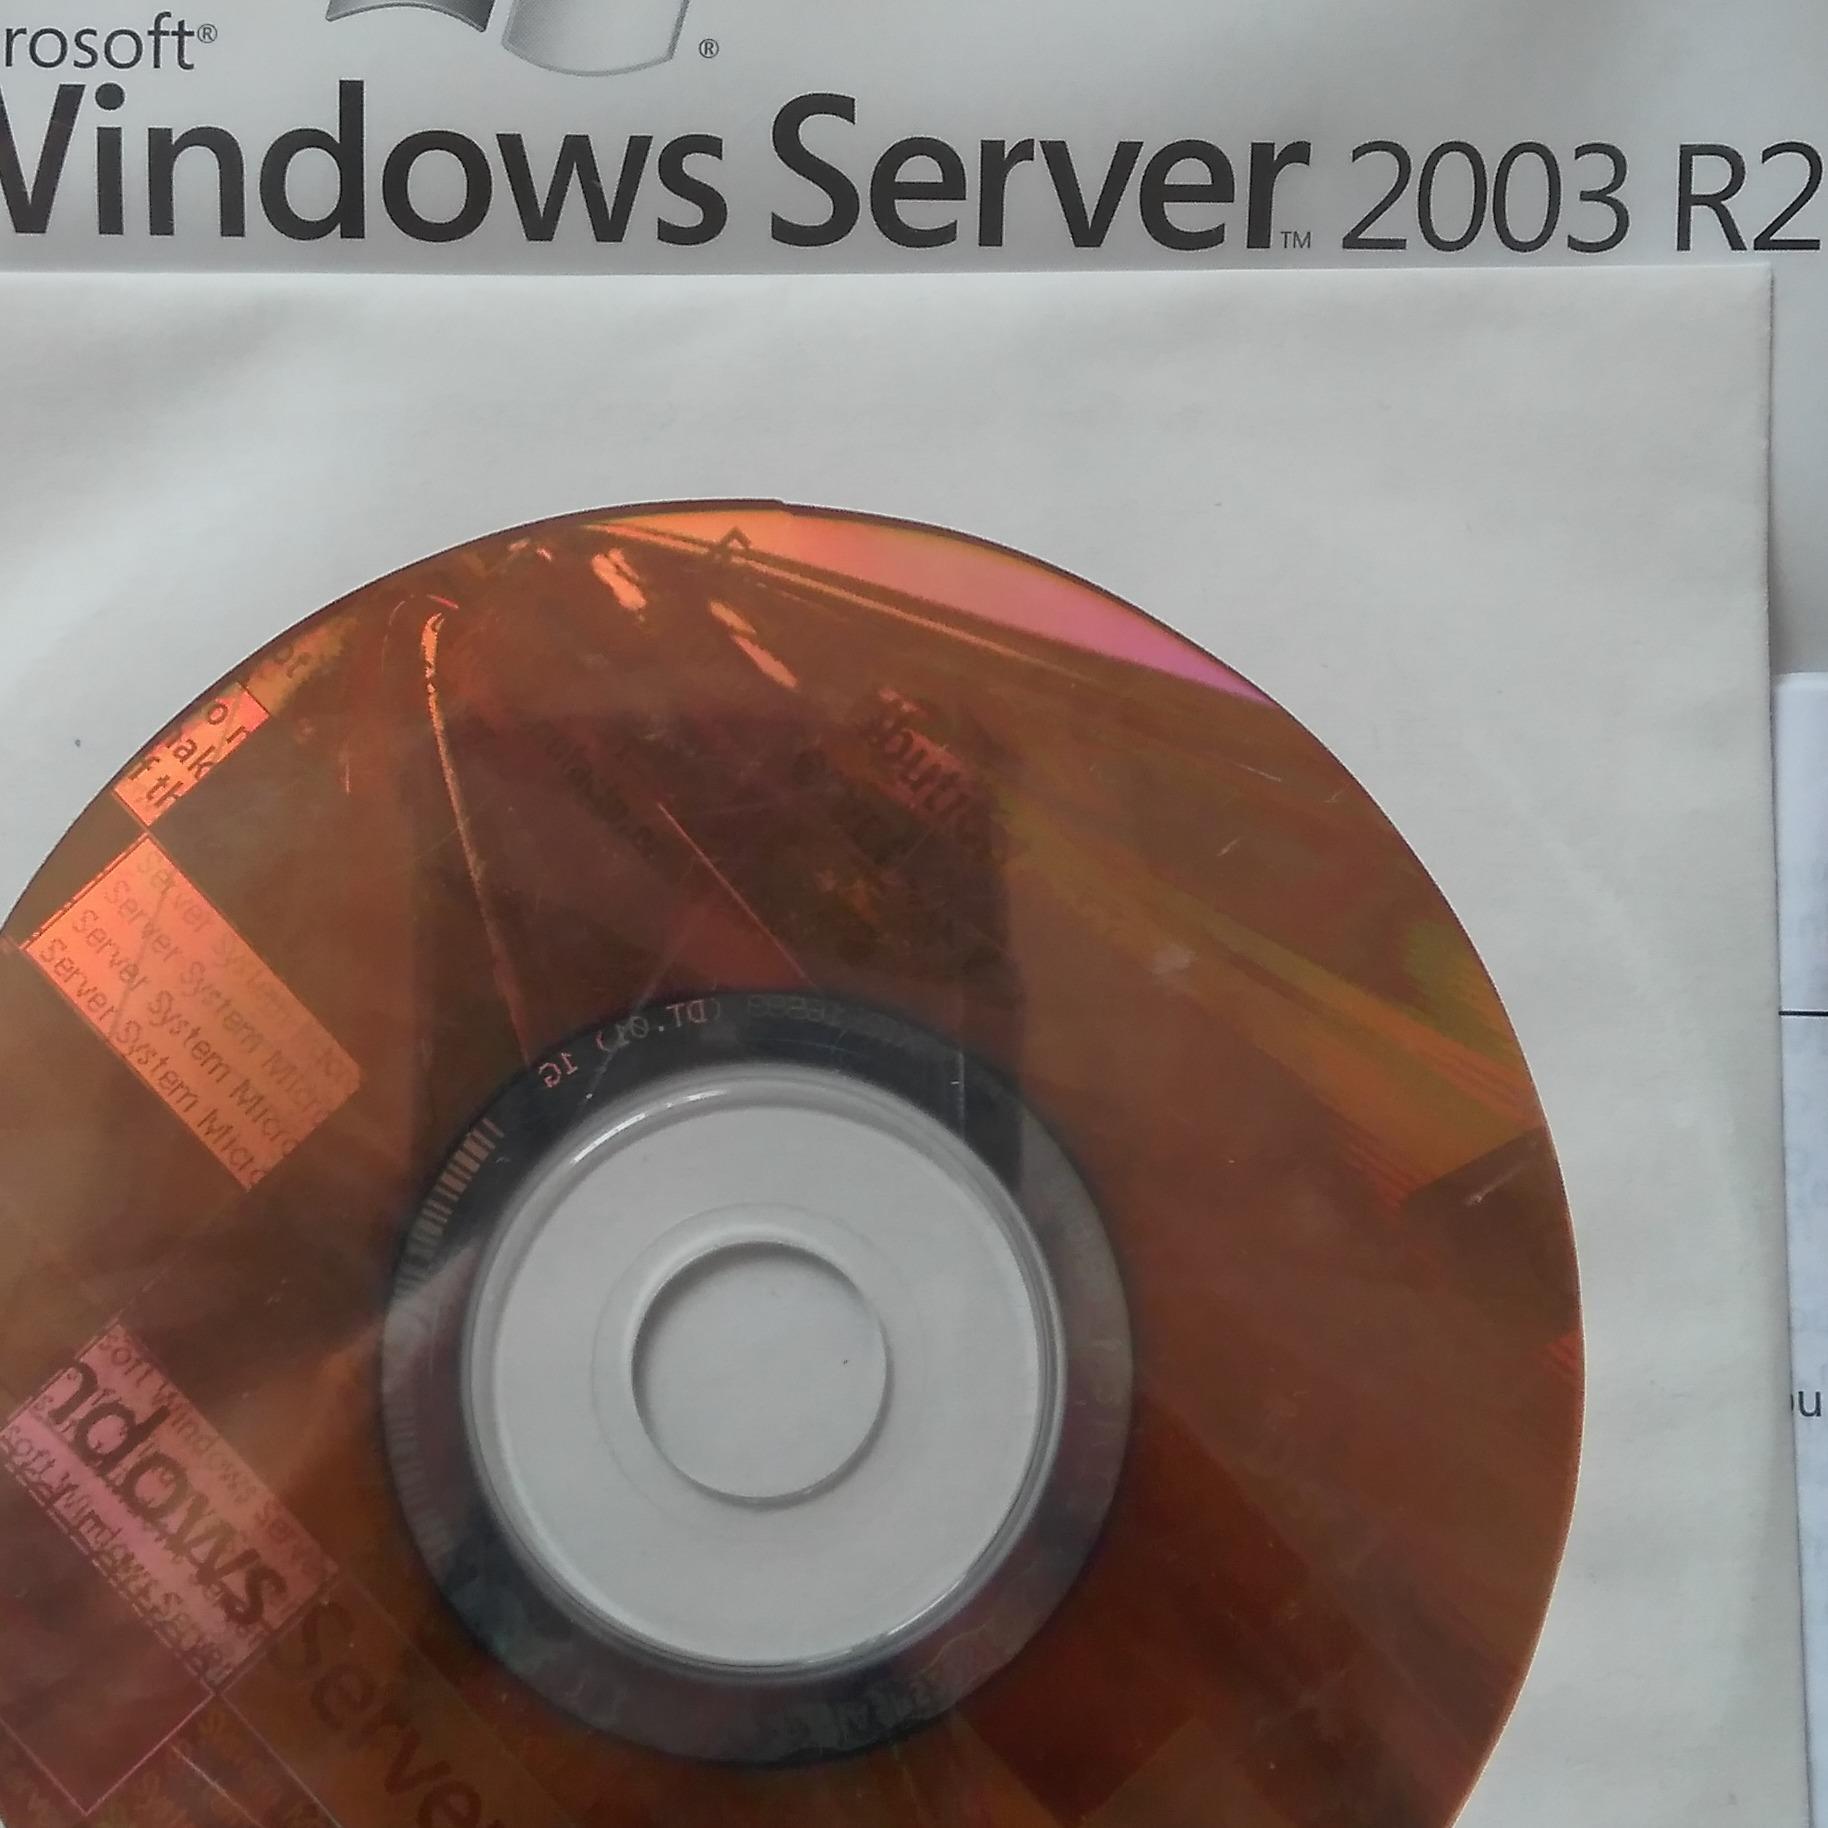 Hình ảnh Windows Server 2003 R2, Standard Edition